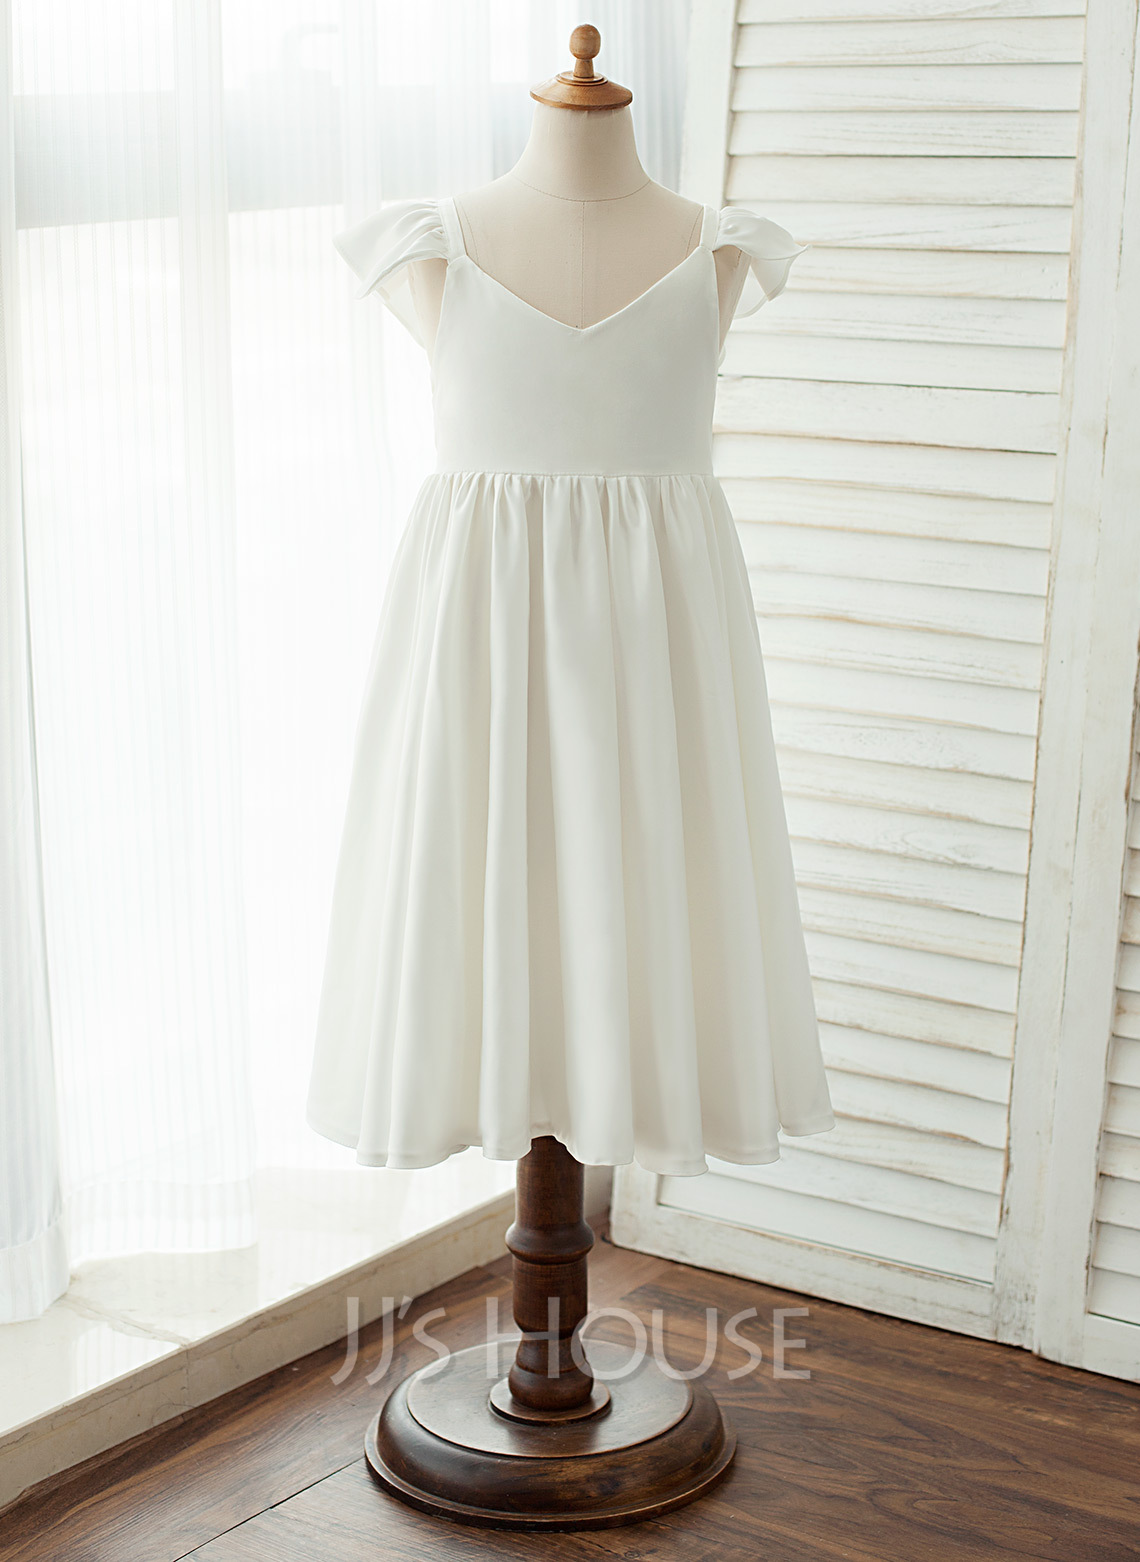 A-Line Tea-length Flower Girl Dress - Chiffon/Satin Sleeveless V-neck